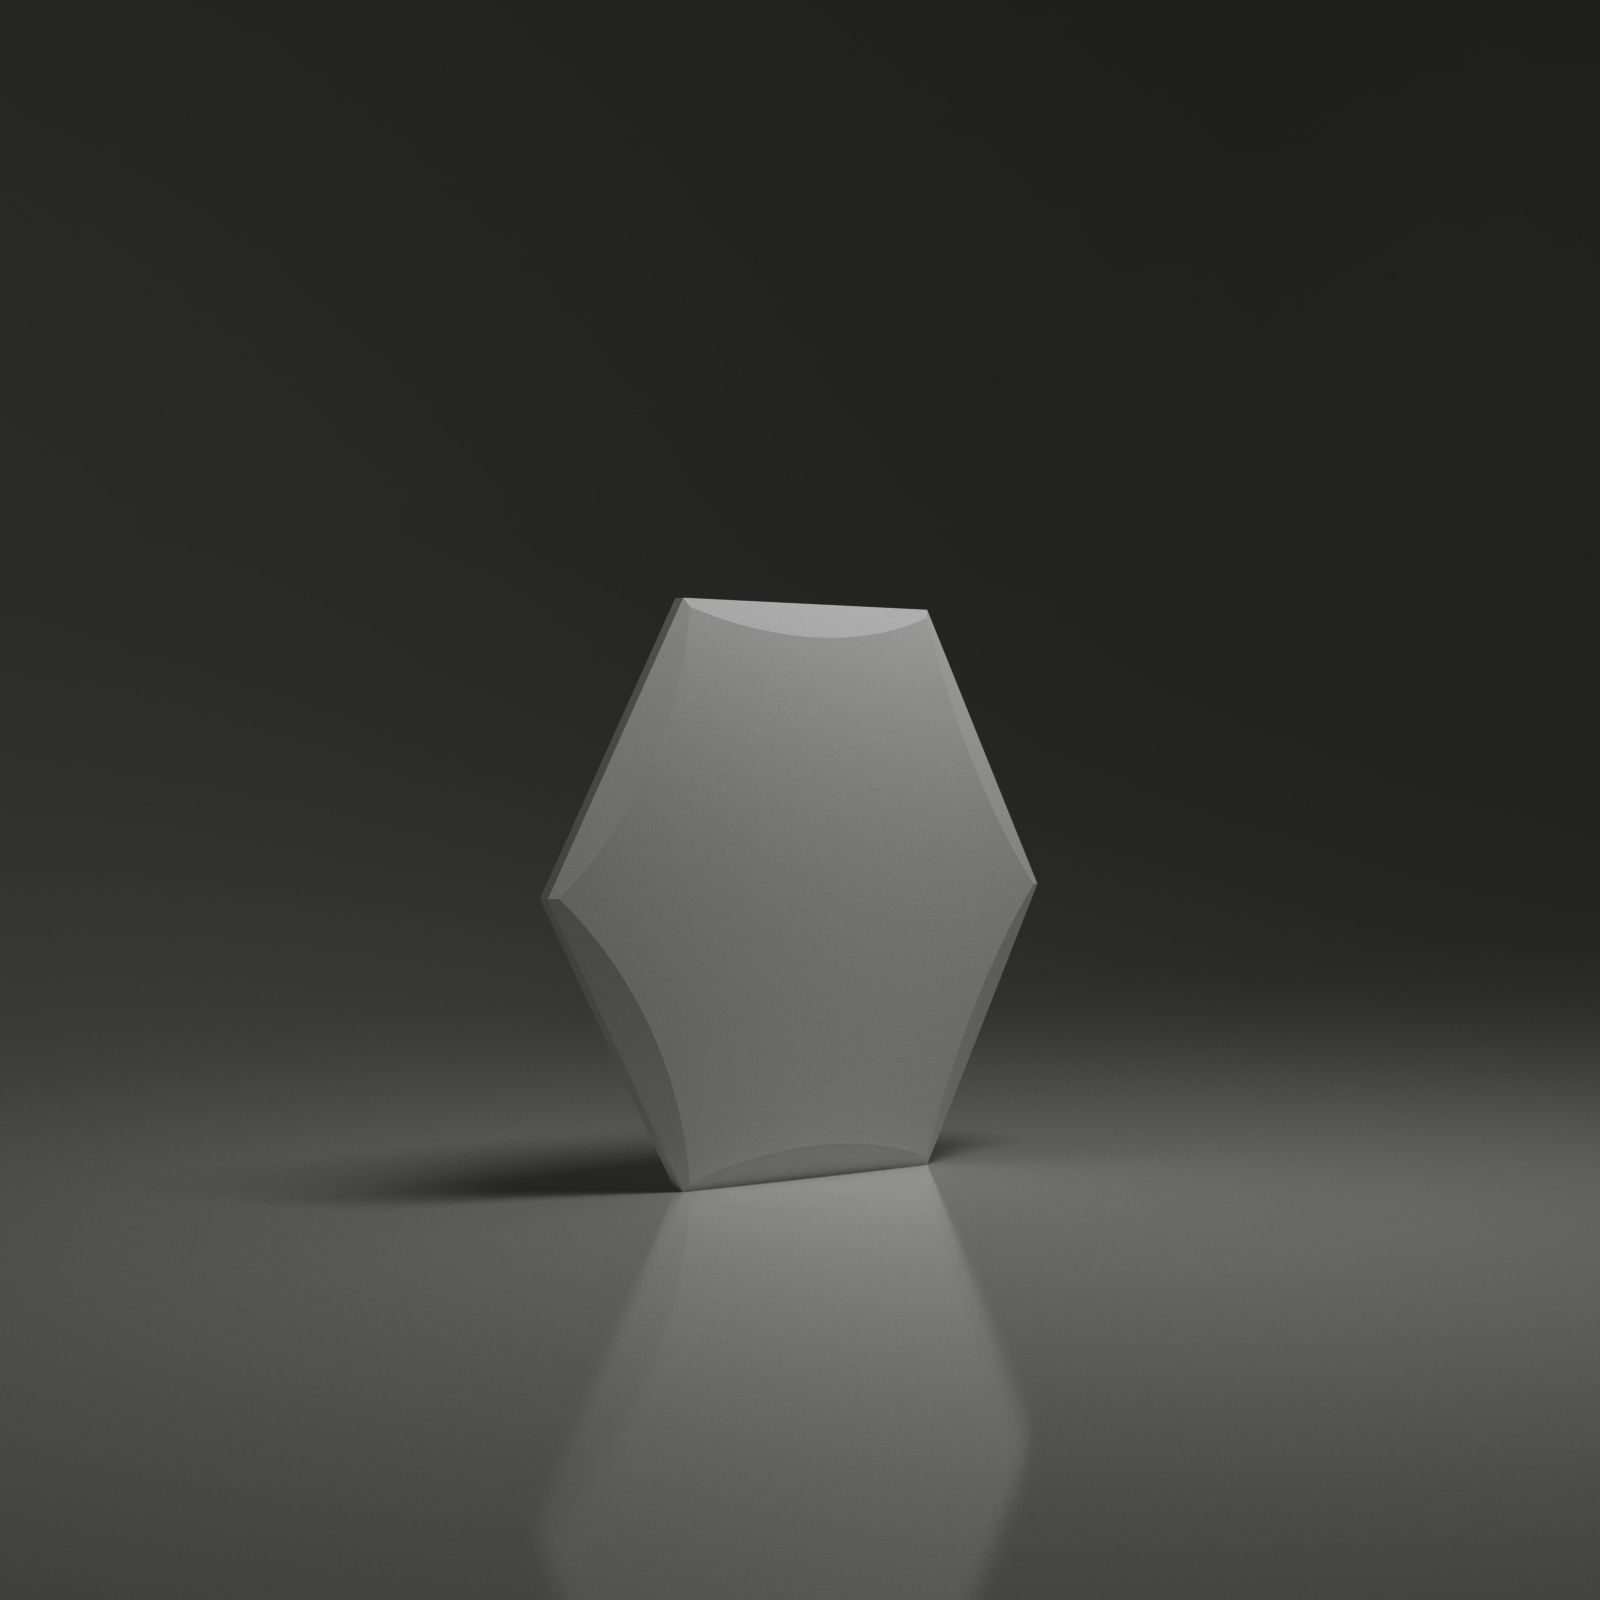 hexagon-football-wizu